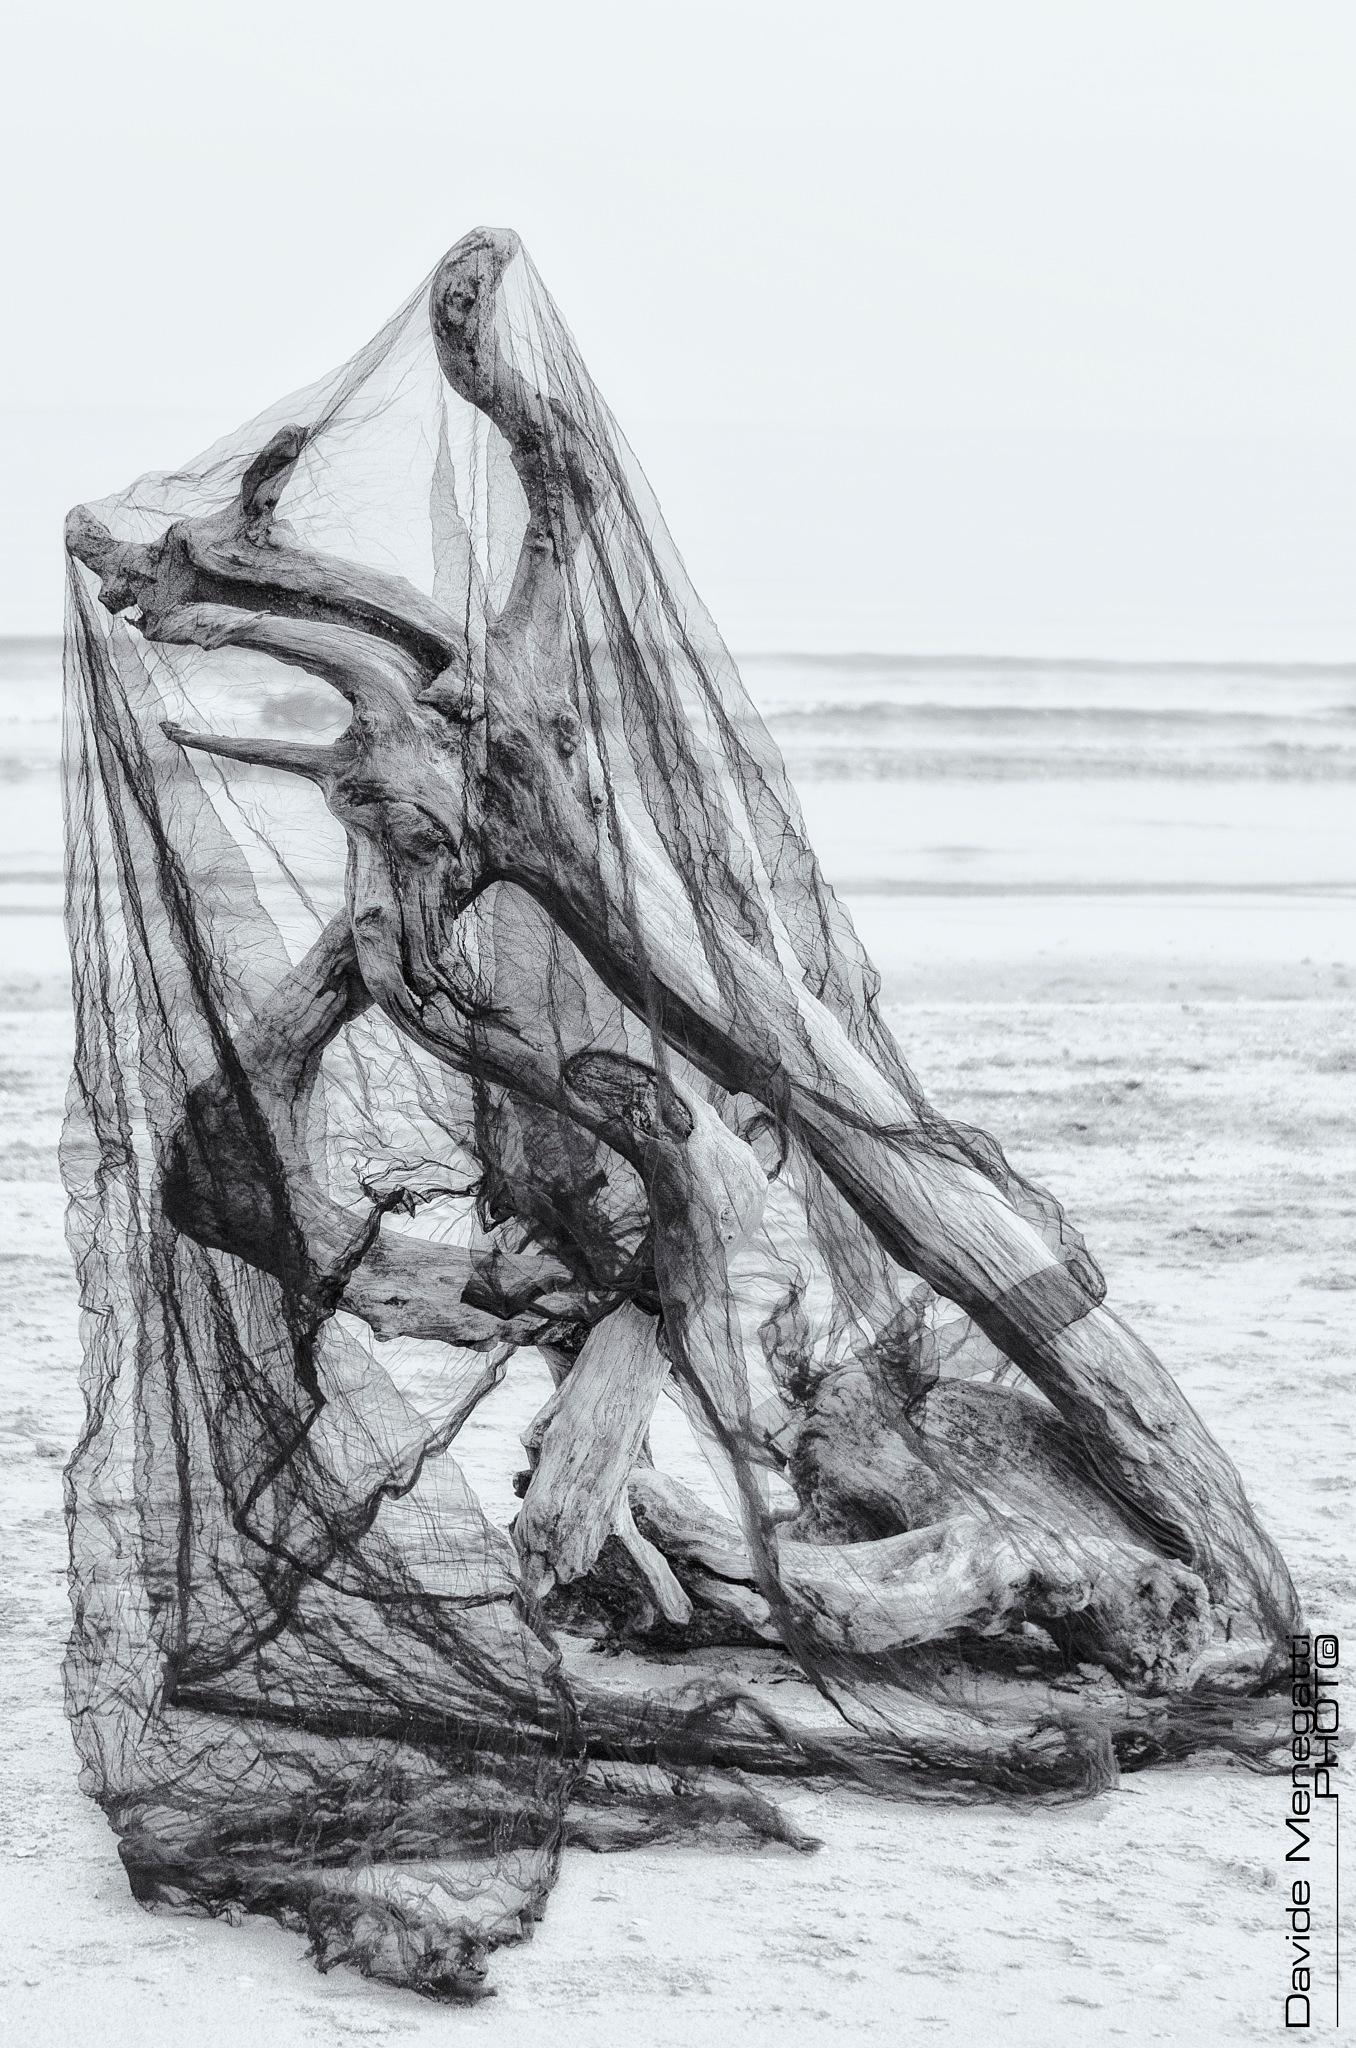 The Black Widow by Davide Menegatti